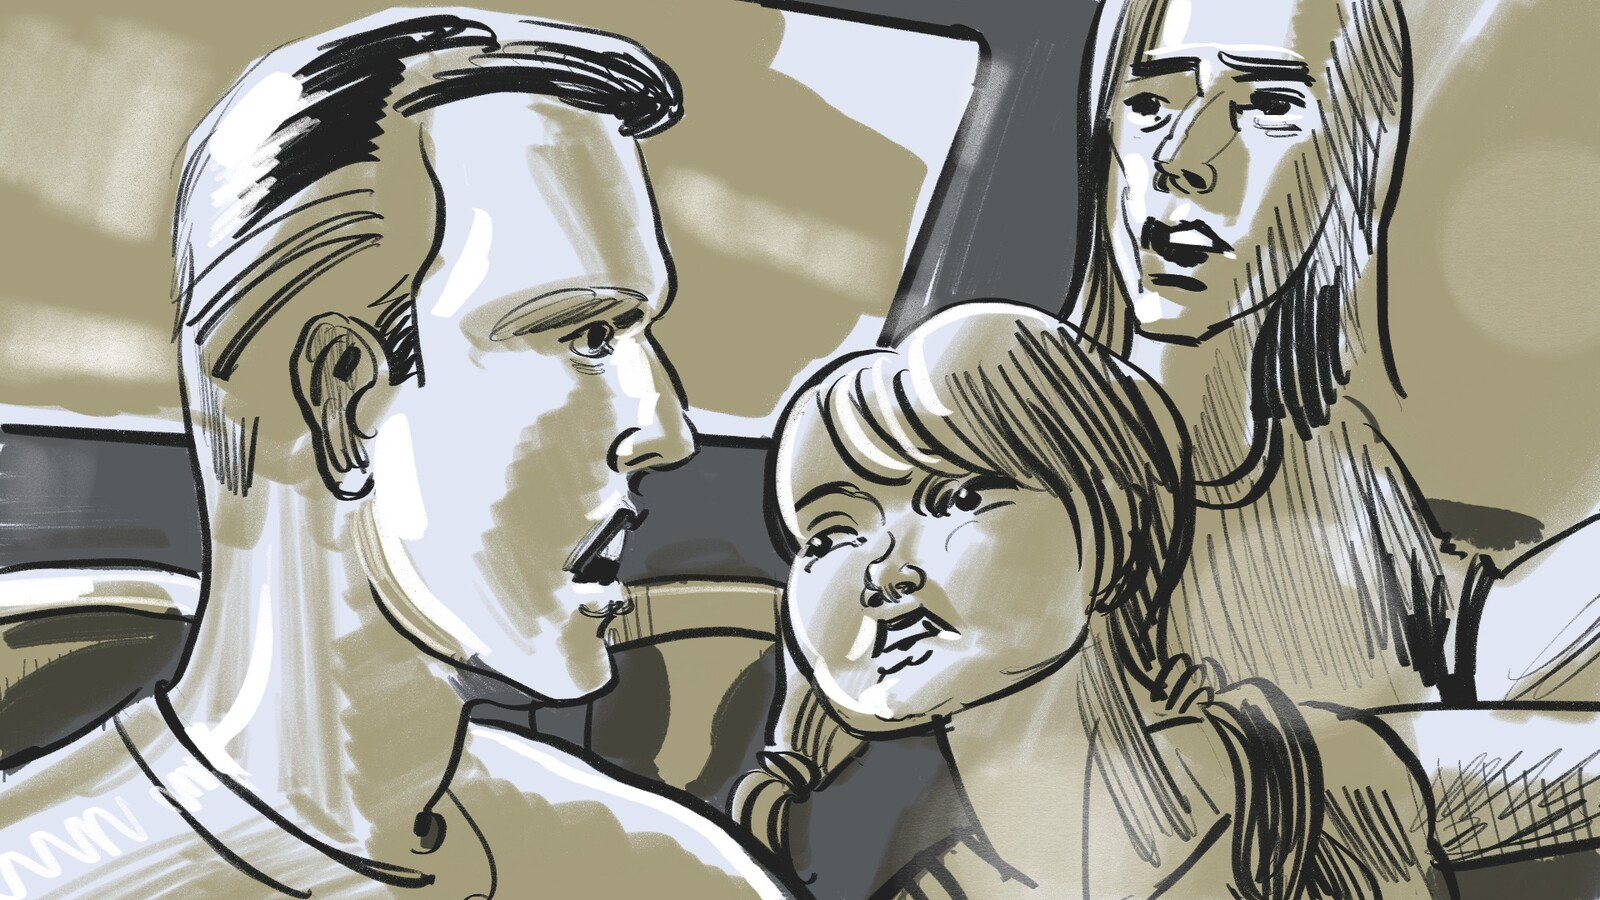 FRAME #25-MS-Med-Floating: 3-shot: Nick, Haden and Z talking the cab.